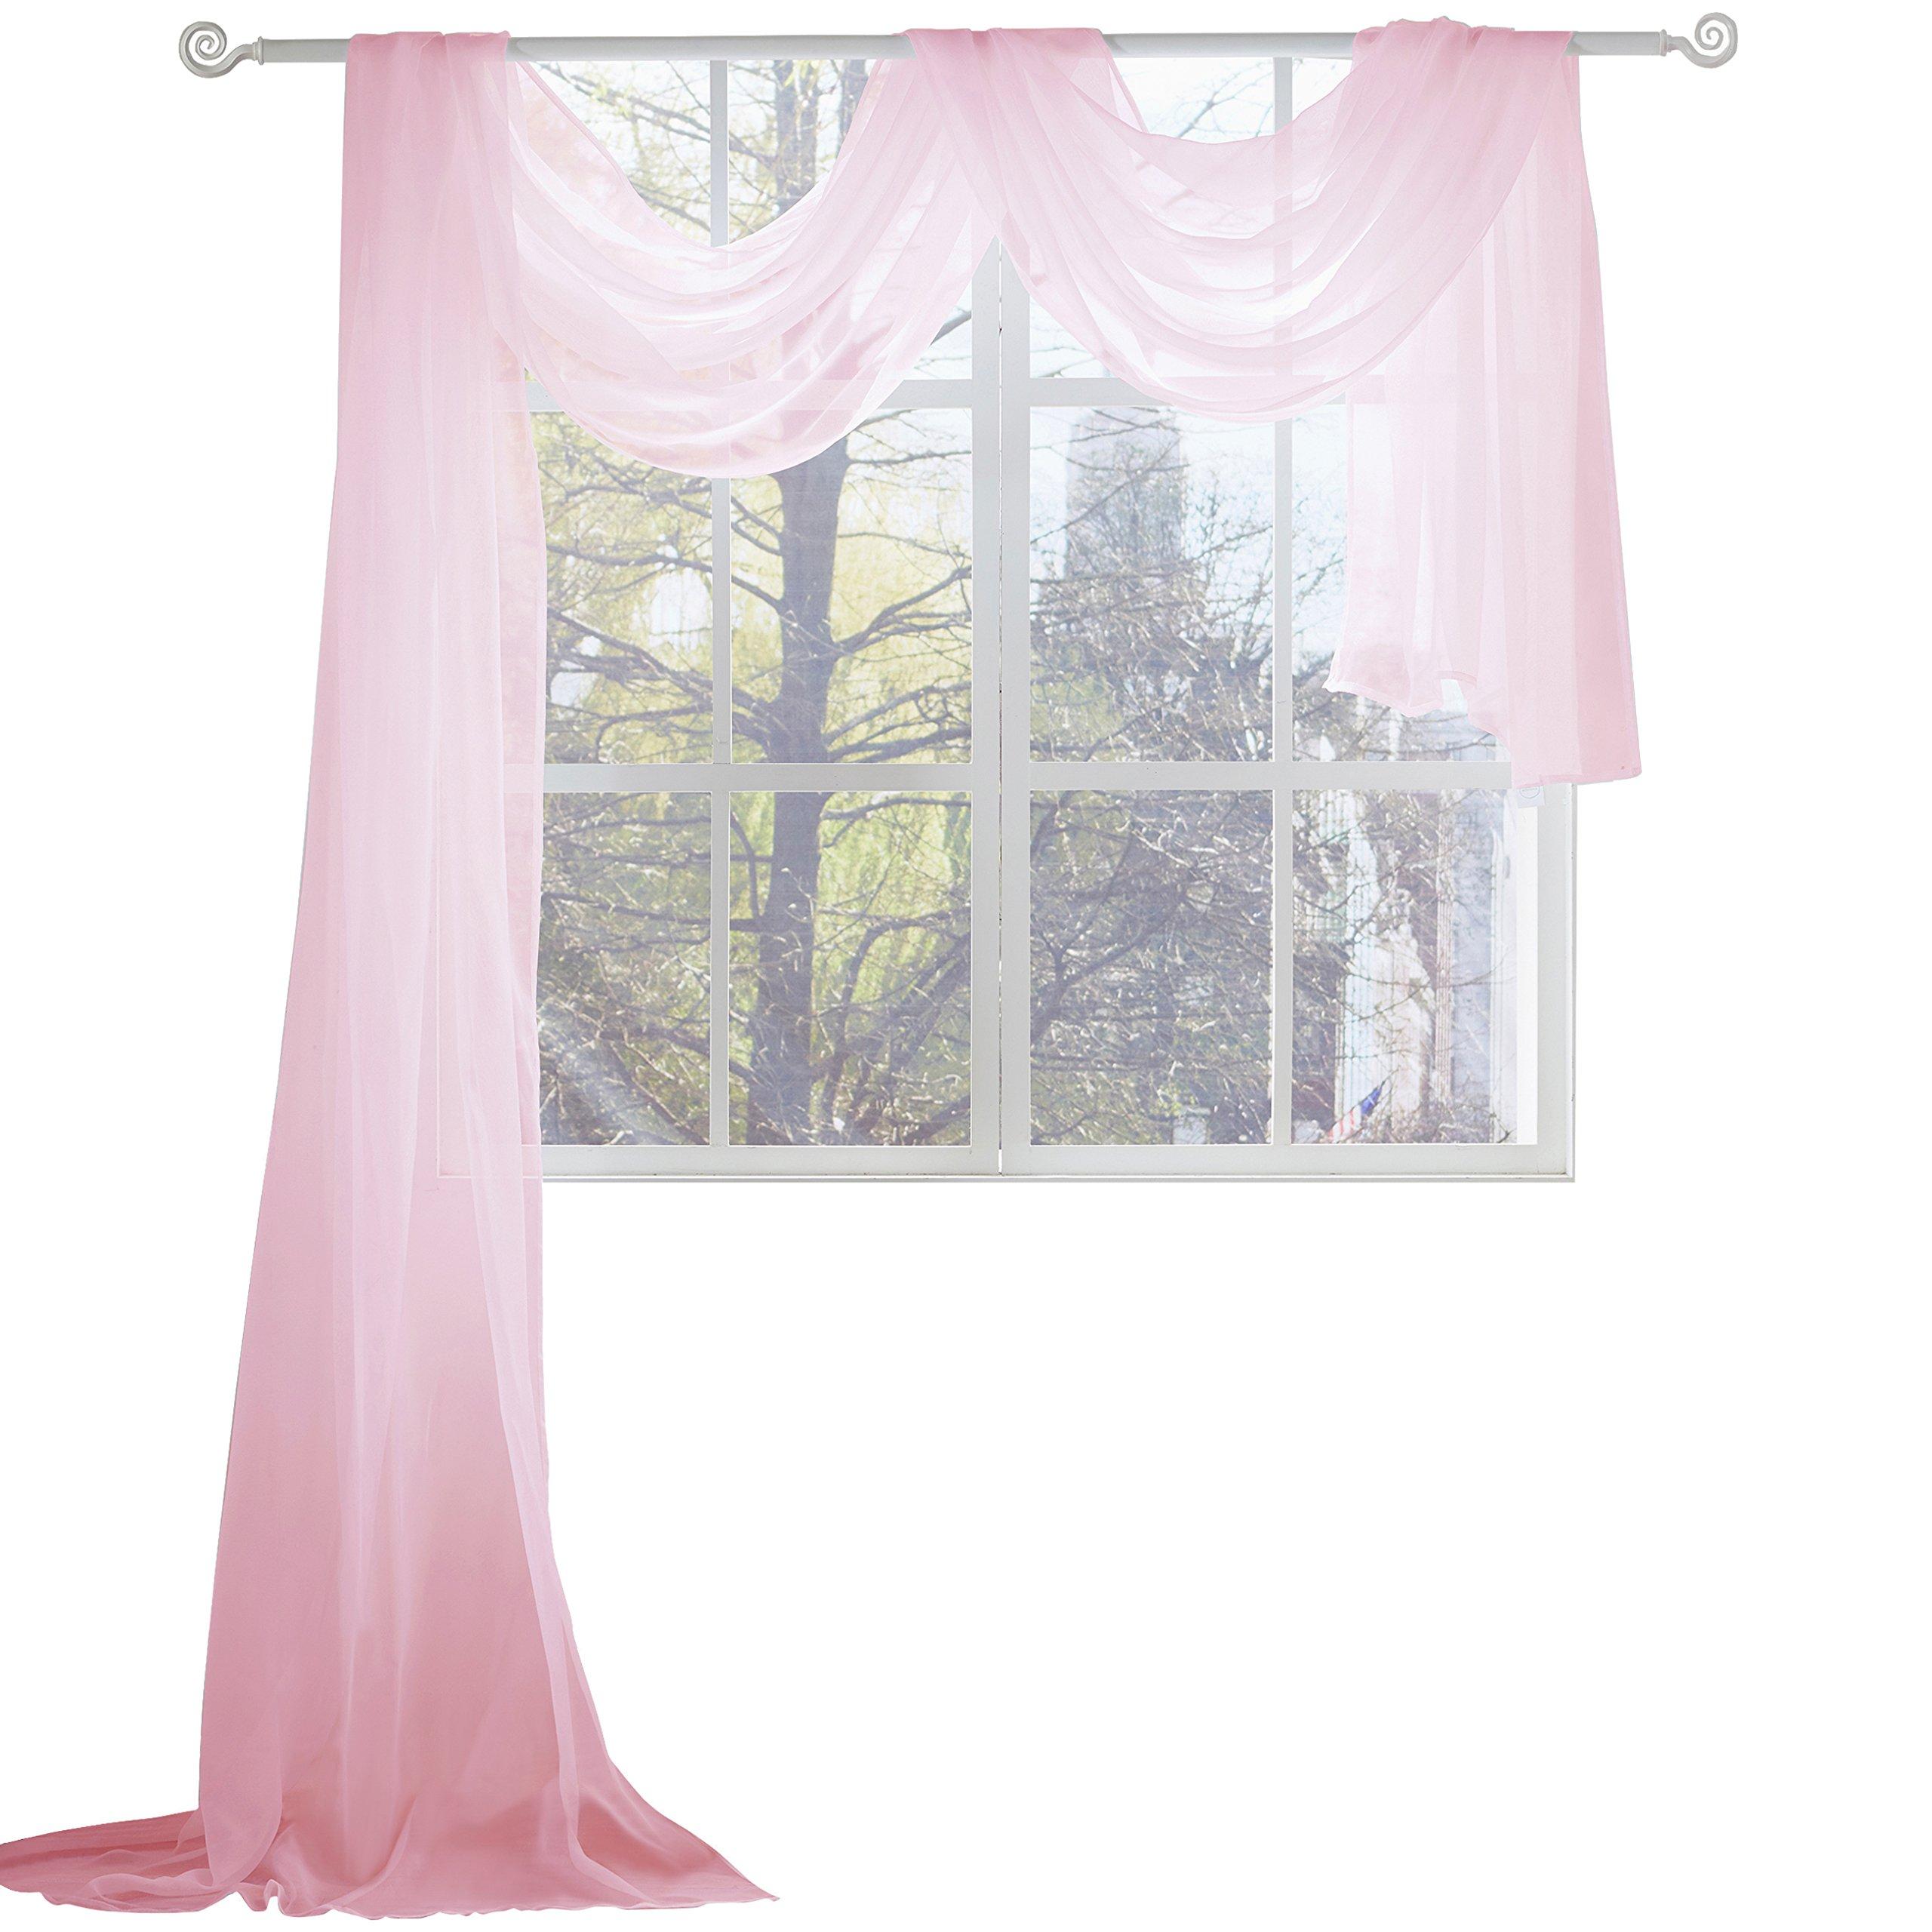 KEQIAOSUOCAI Pink Sheer Window Scarf-Valance,52''x216'',Pink